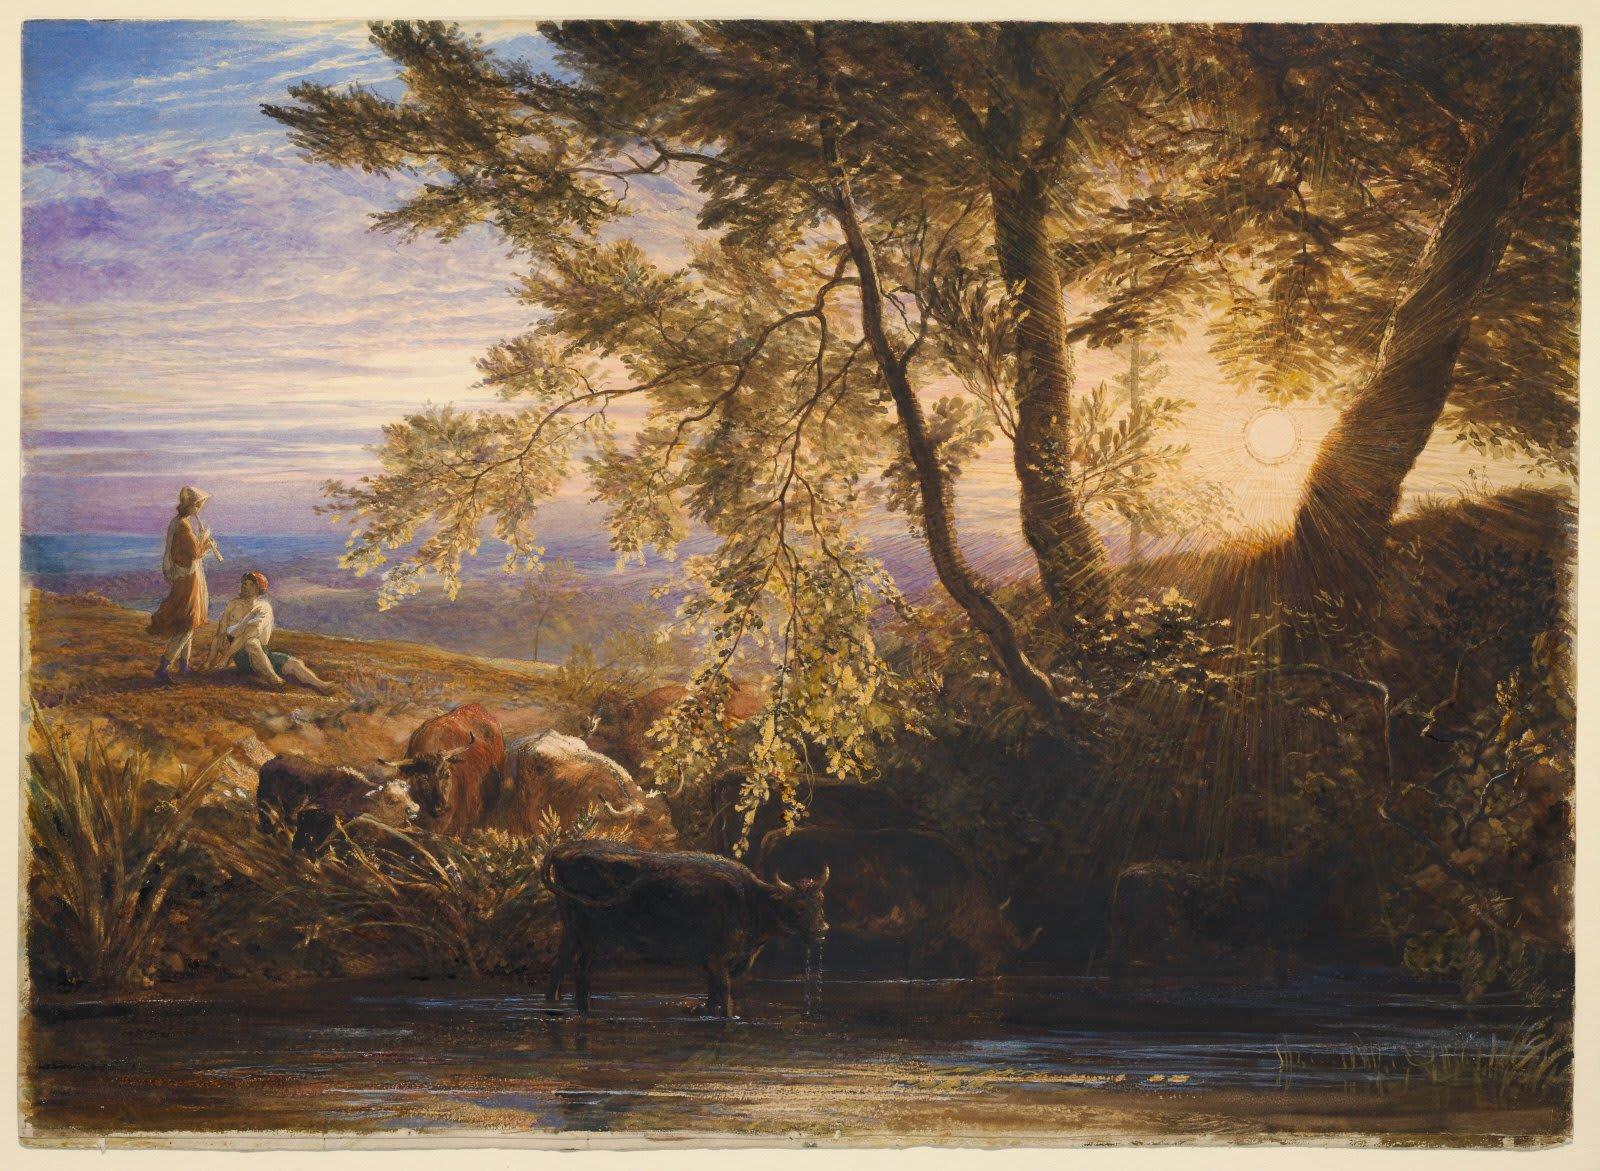 Англия, 1862 год. Художник Samuel Palmer